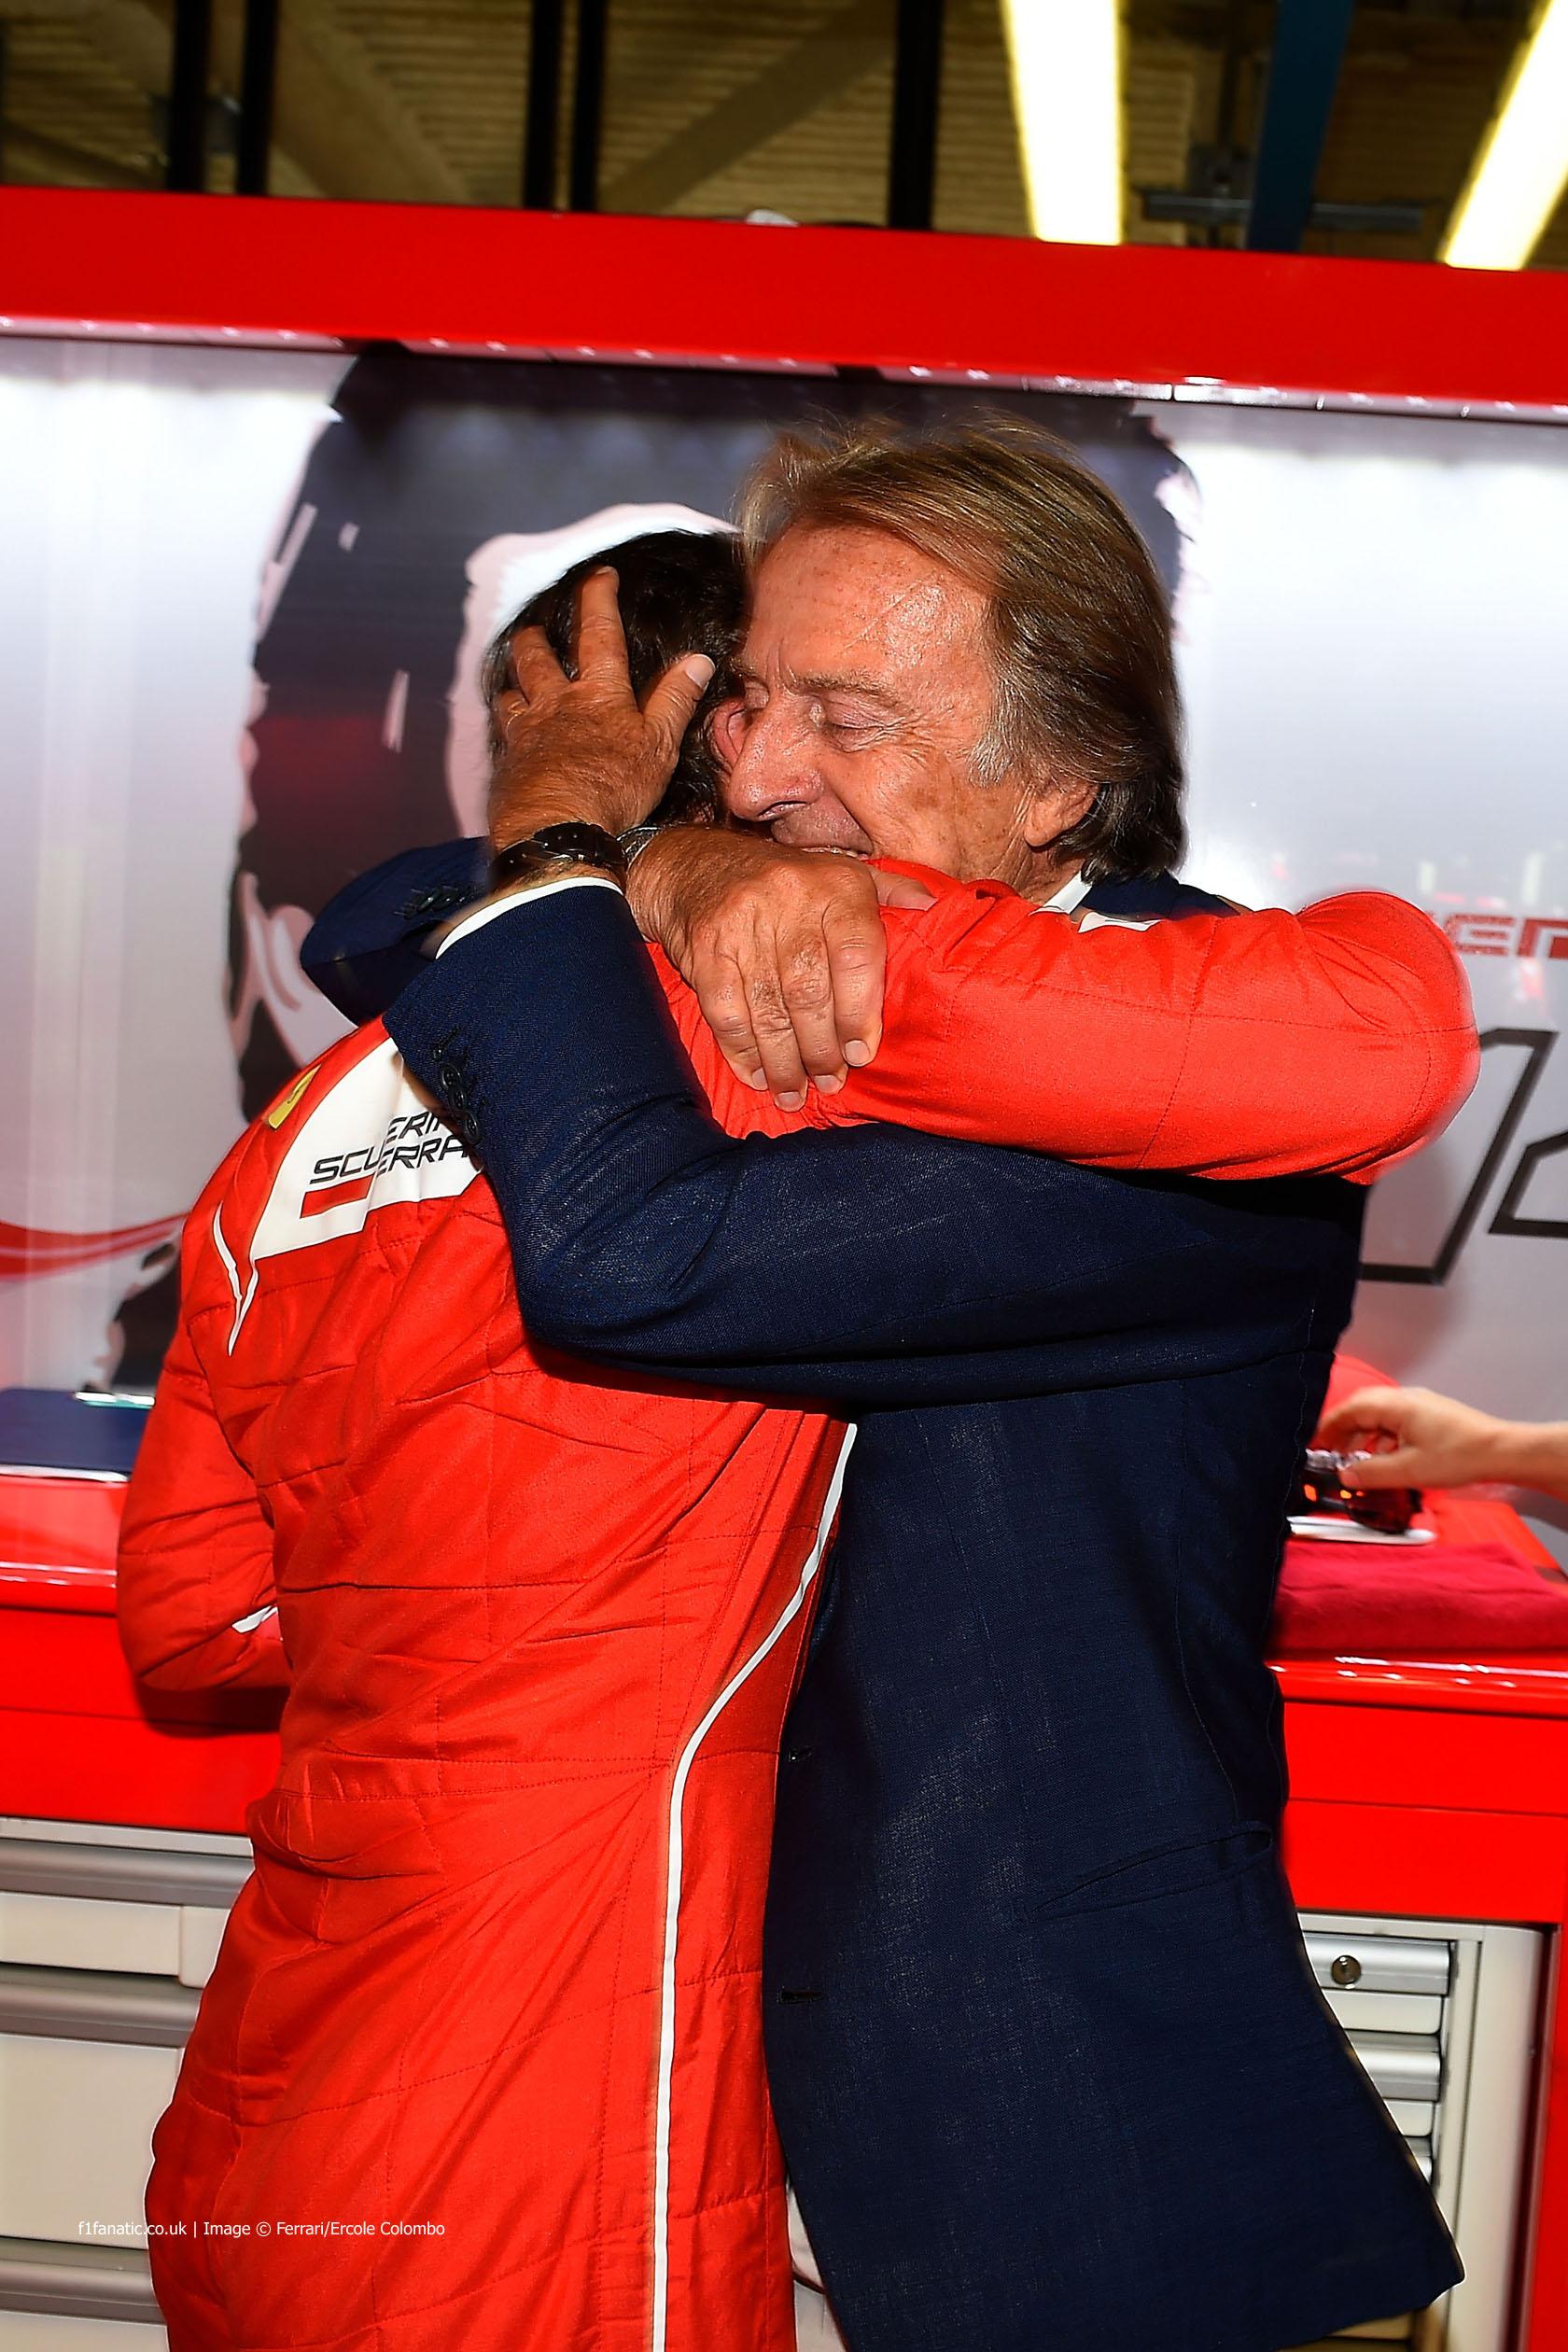 Alonso and Di Montezemolo embracing at the 2014 Italian GP